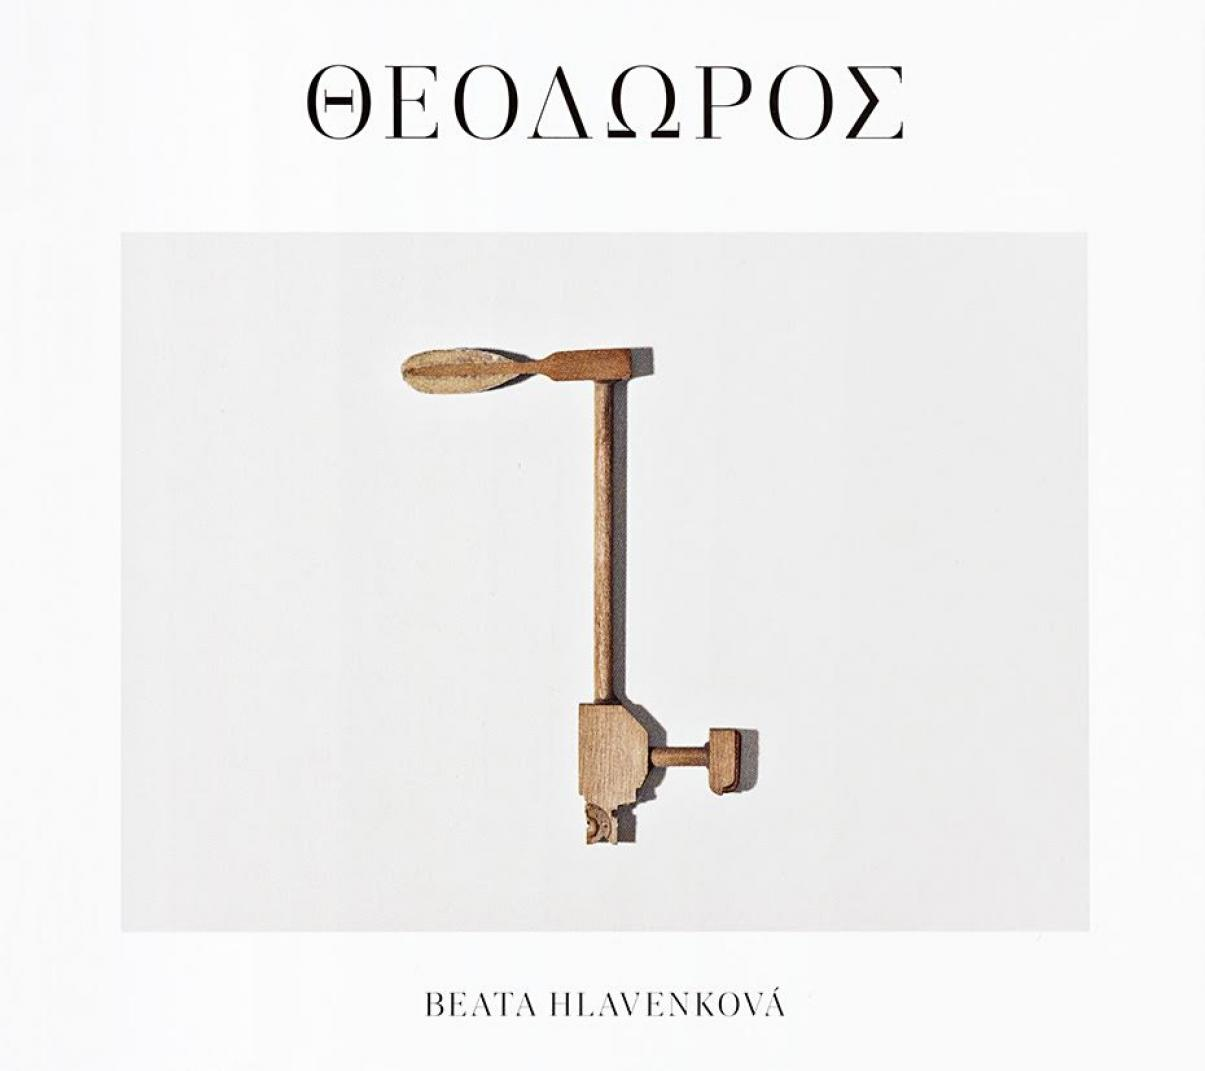 Beata Hlavenková: Theodoros